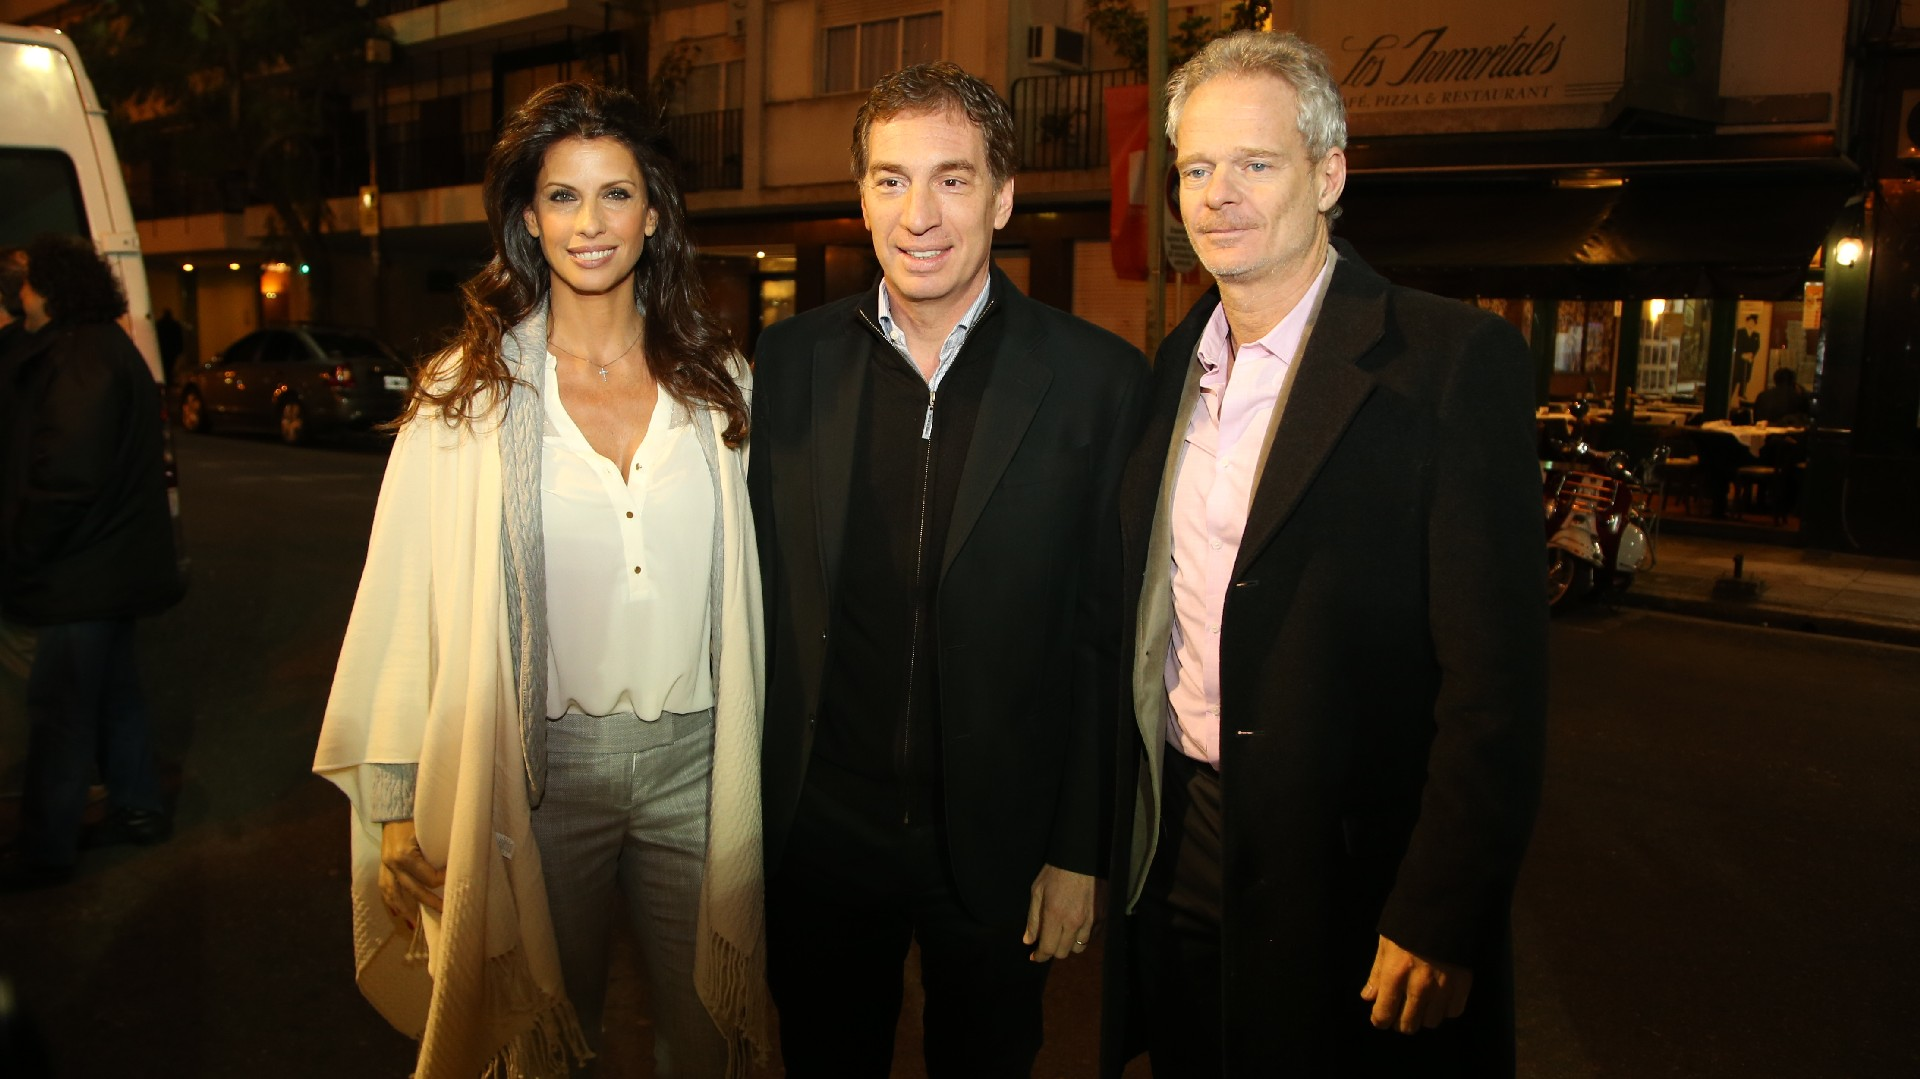 Analía Maiorana, Diego Santilli y Hernán Nisenbaum